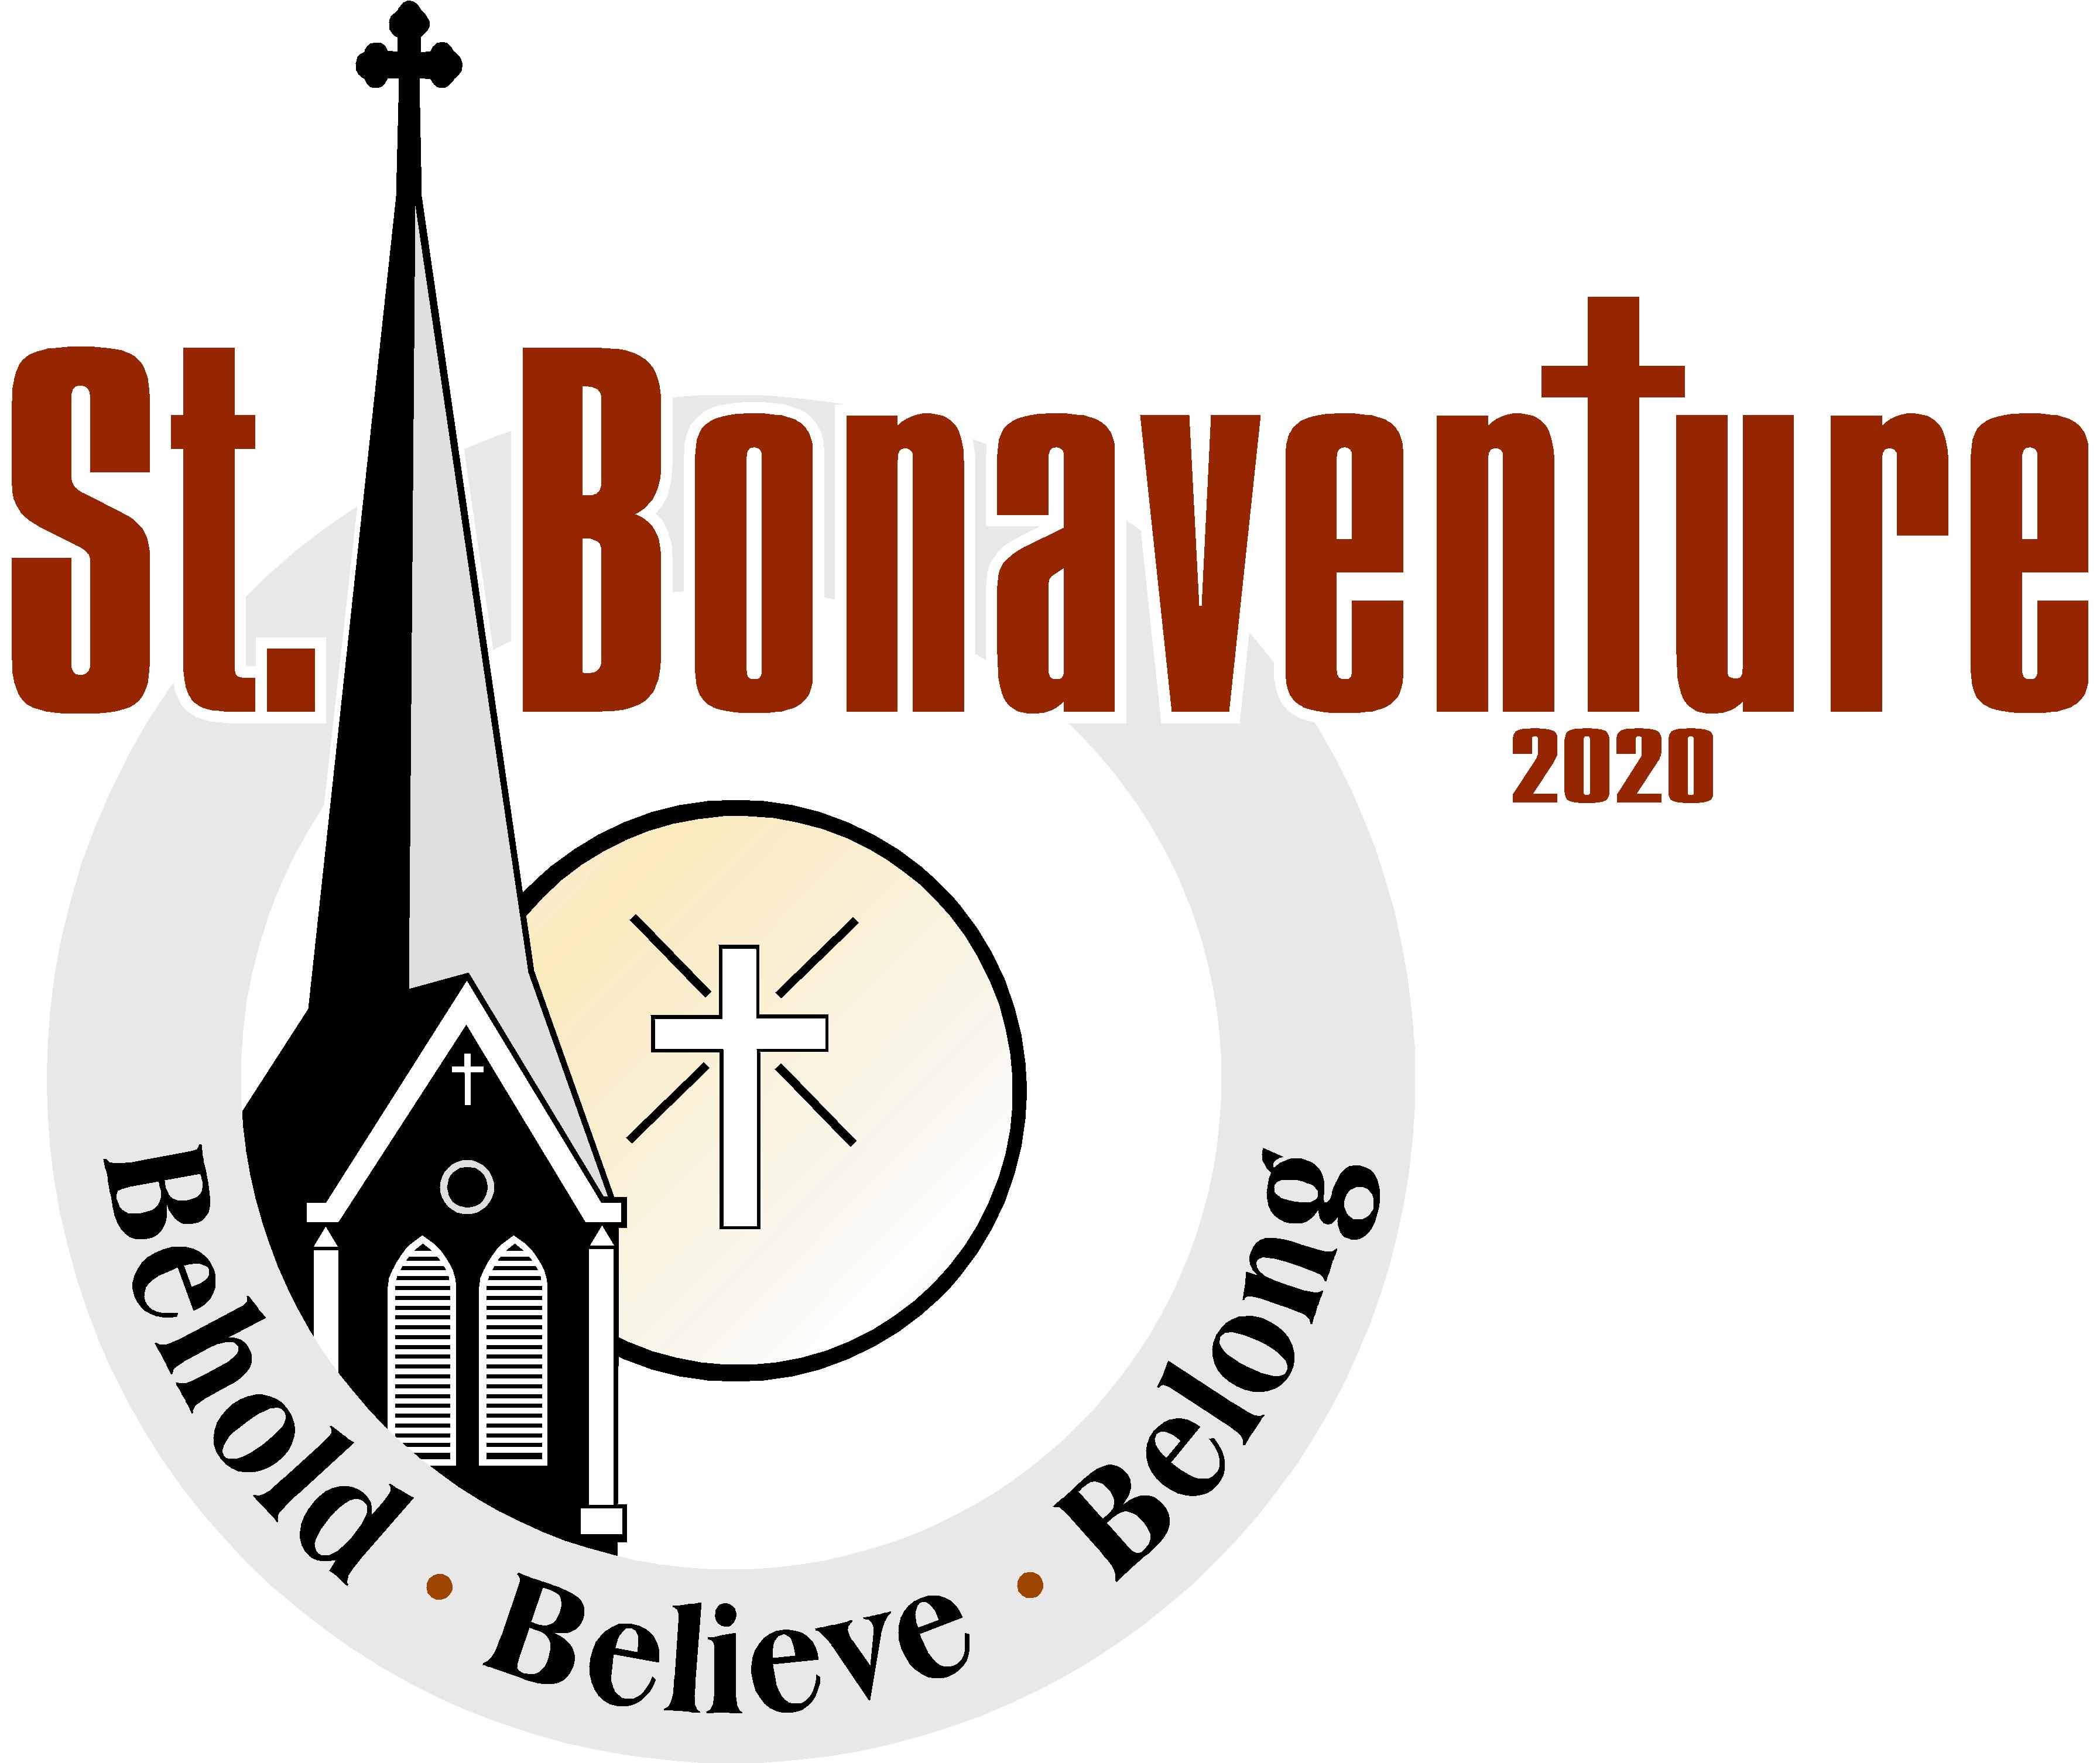 Parish bulletins saint bonaventure. Invitation clipart bulletin